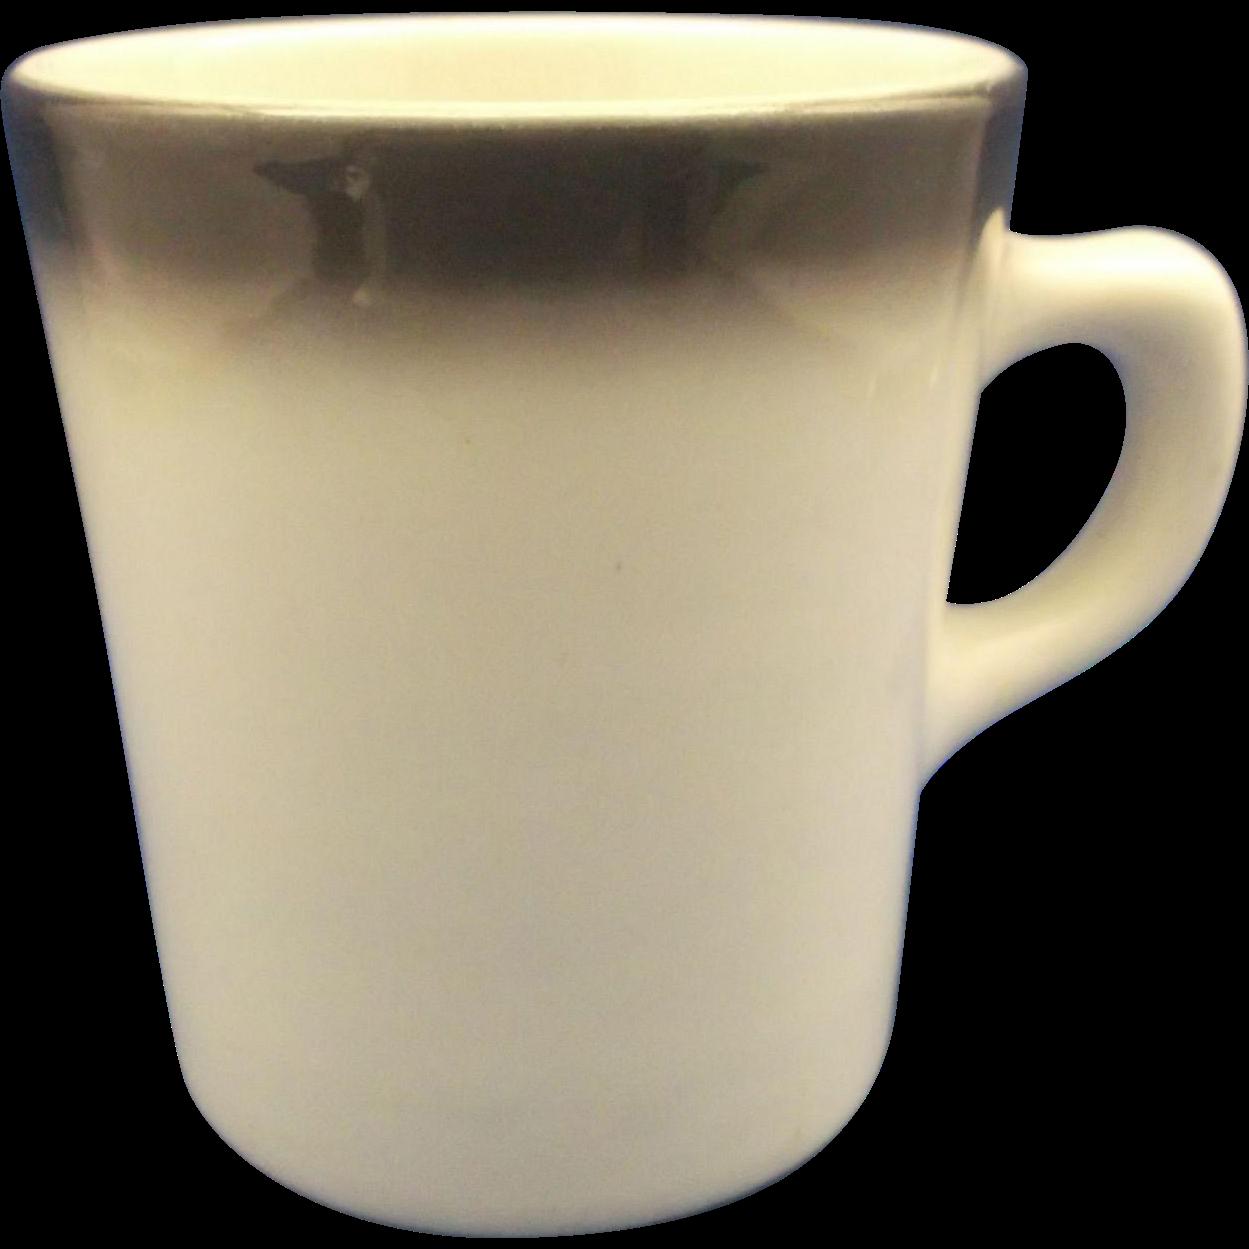 Restaurant Ware Mug Black Fade Ombre Rim